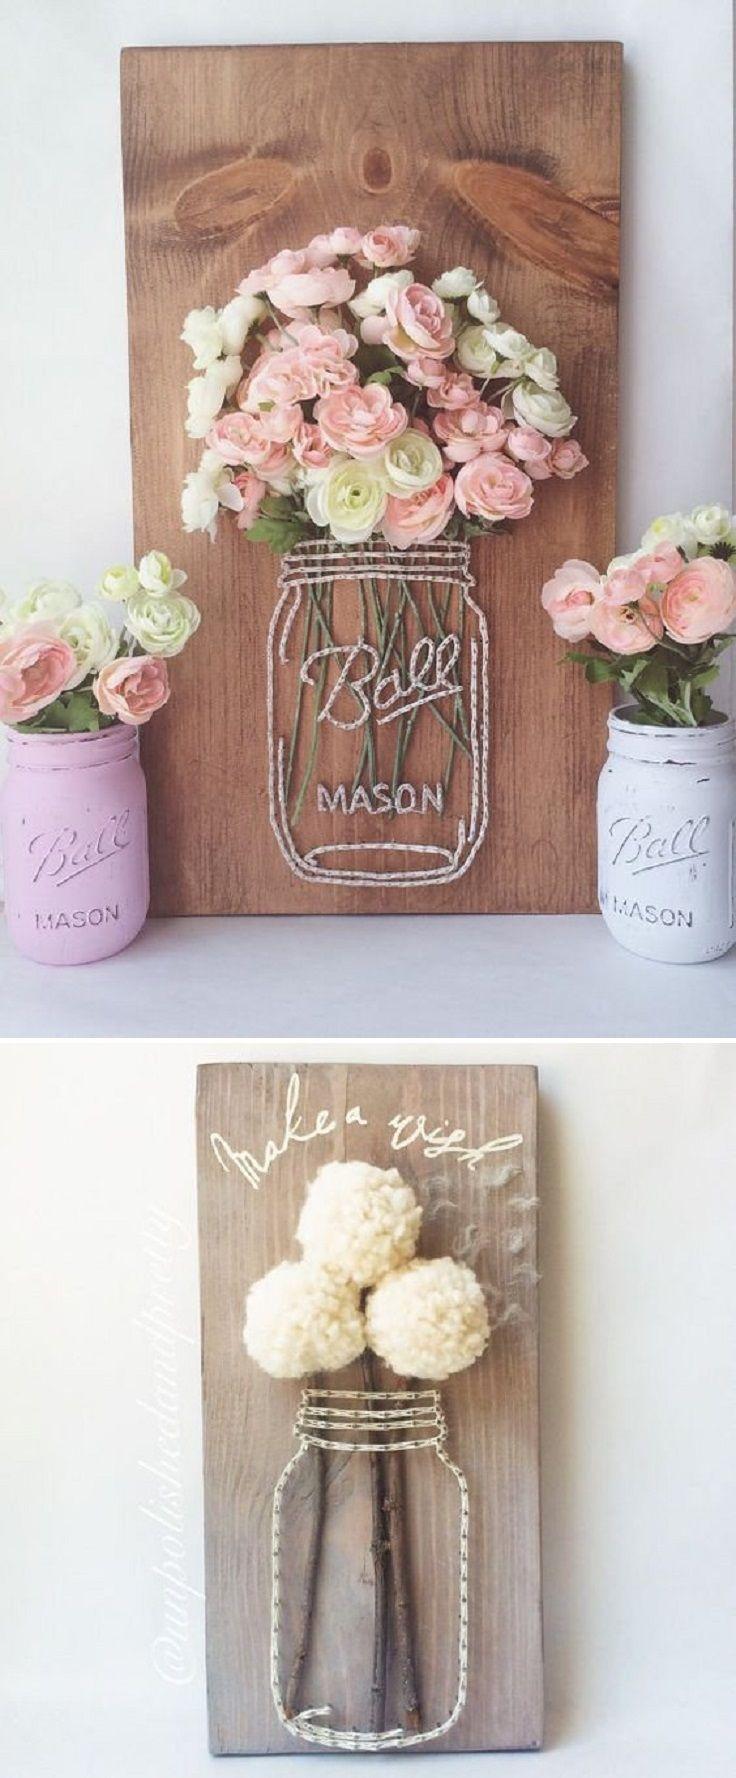 DIY Christmas Mason Jar Lighting Craft Ideas Instructions Jar - Artist turns nyc trash cans into giant flower filled vases